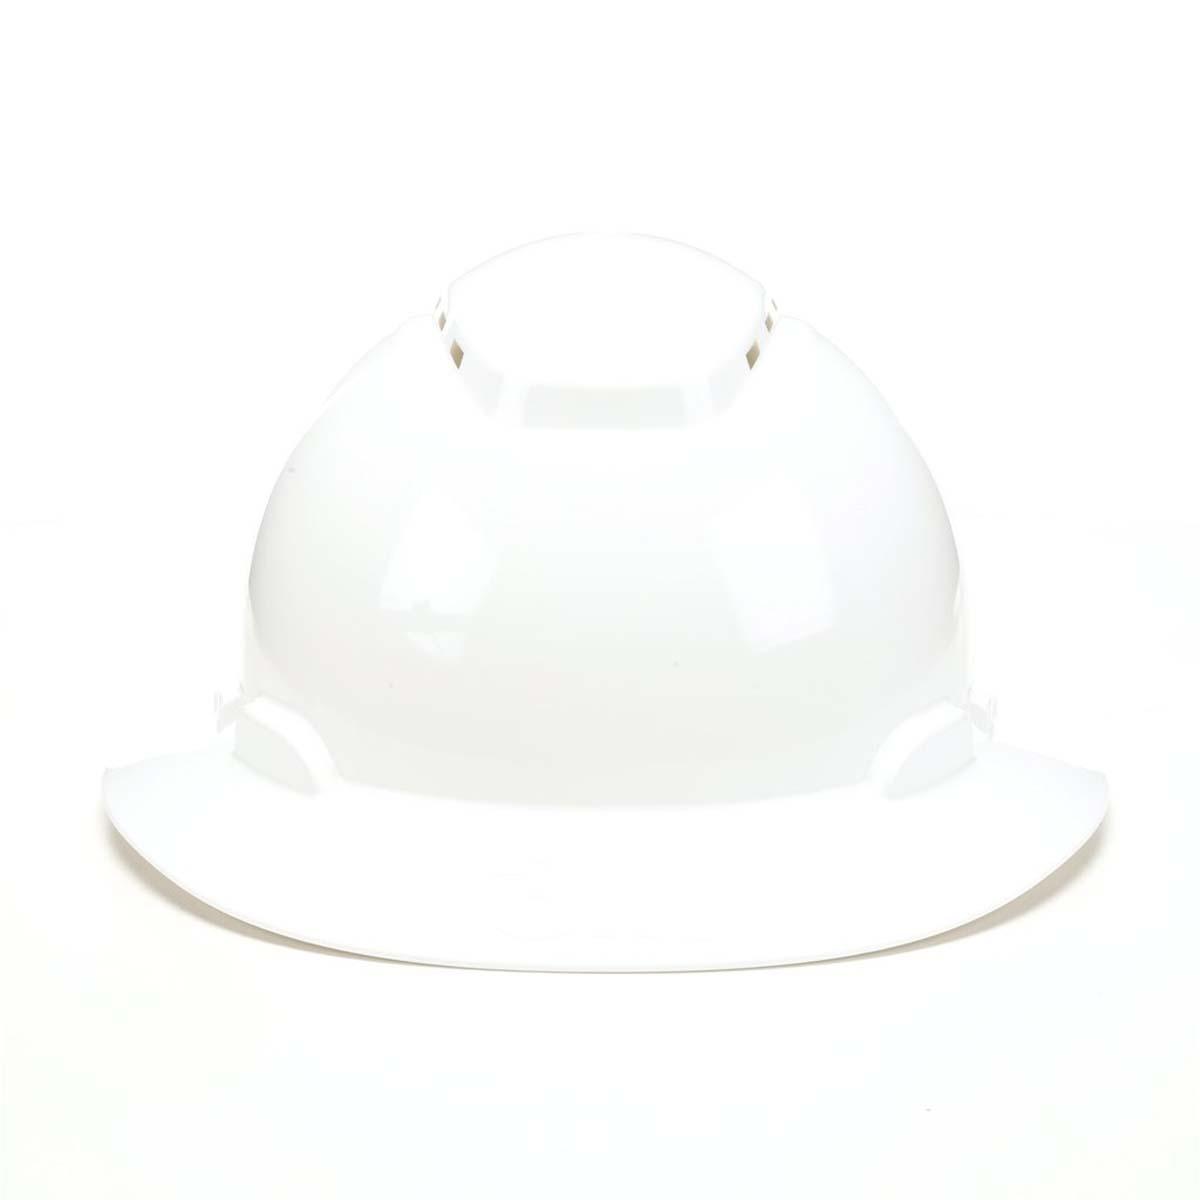 "3Mâ""¢ Full Brim Hard Hat H-801V, White 4-Point Ratchet Suspension, Vented,"